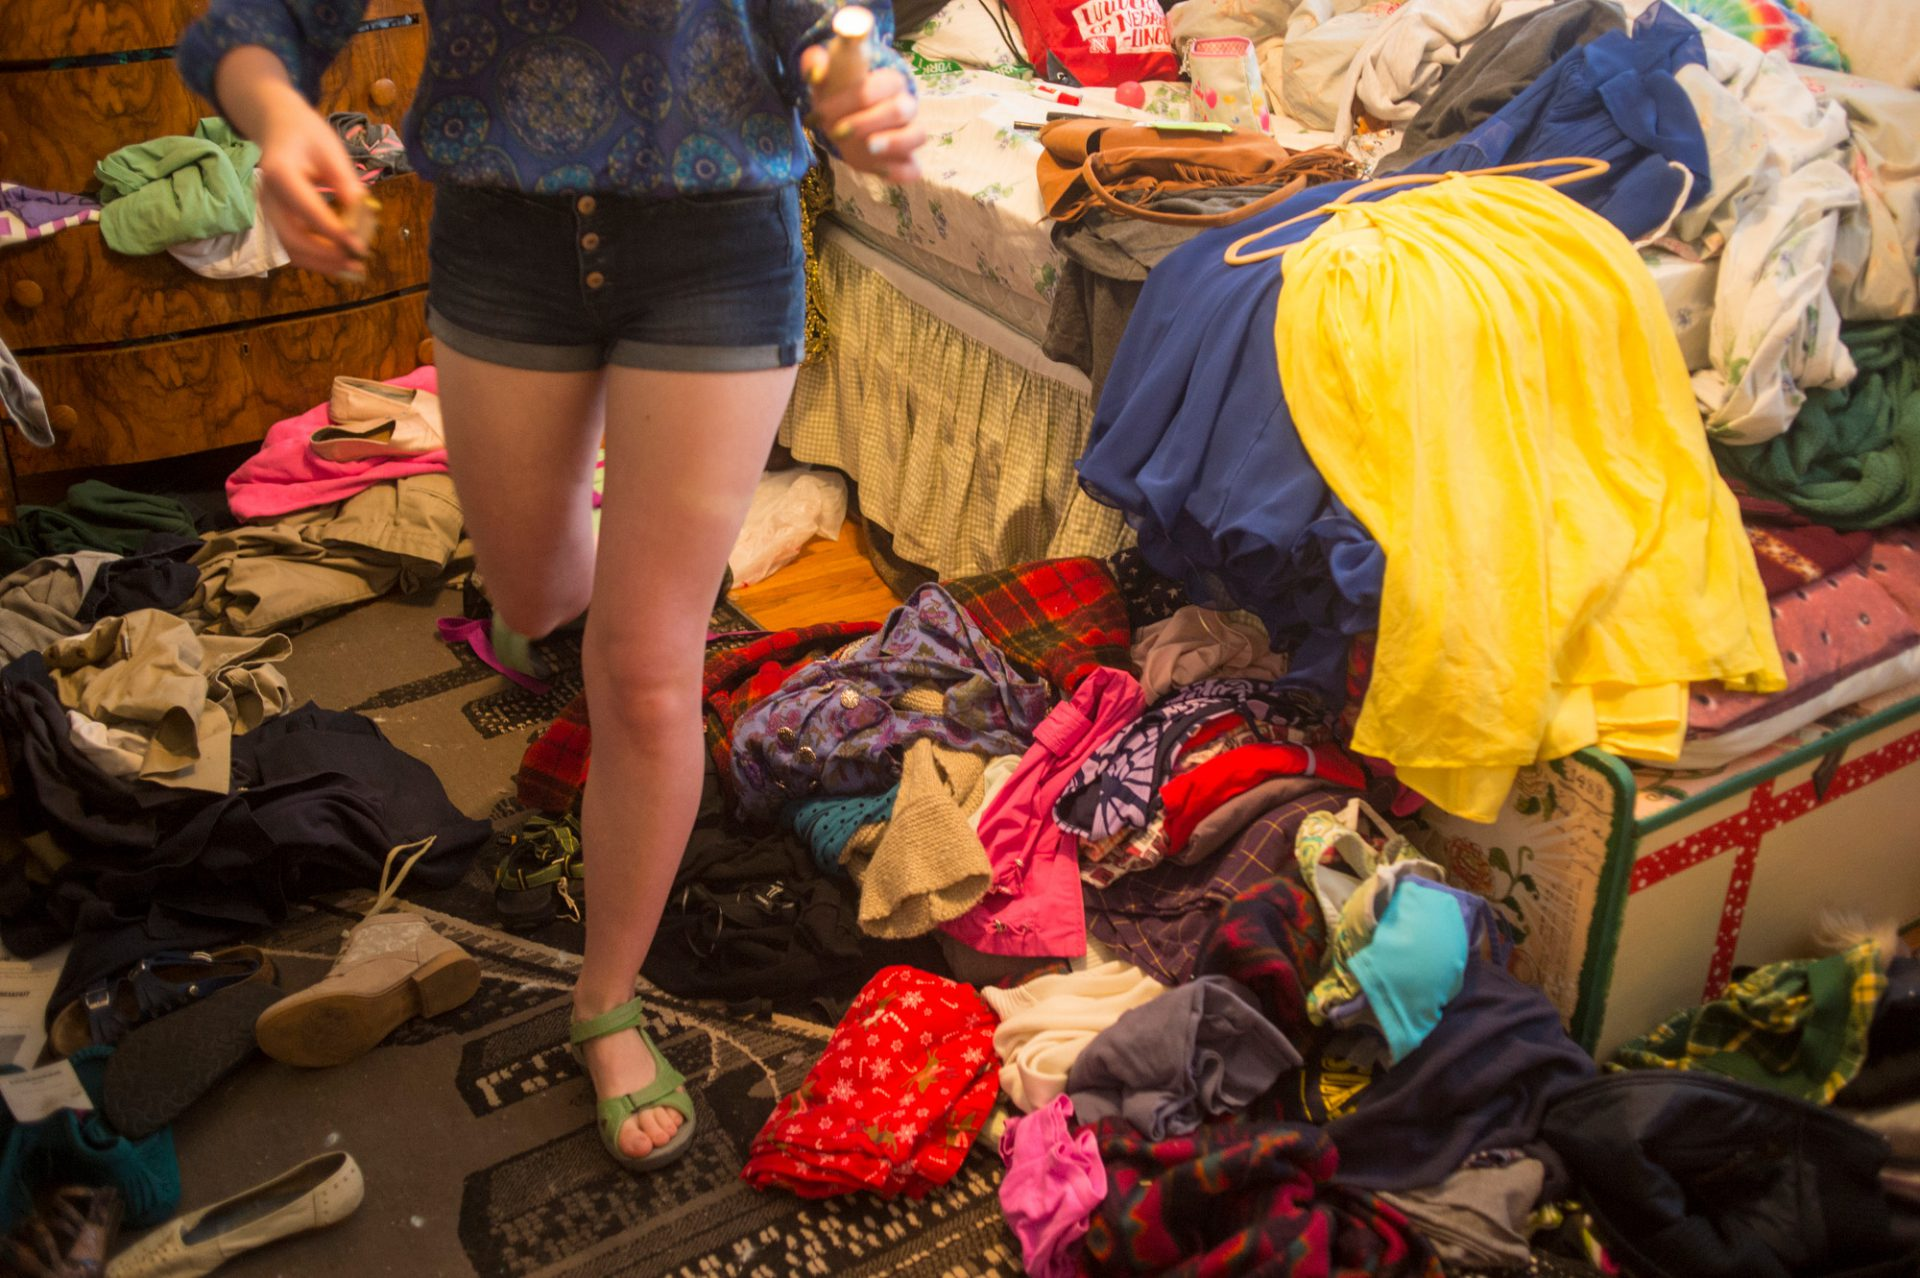 Photo: A teenage girl walks through her bedroom.